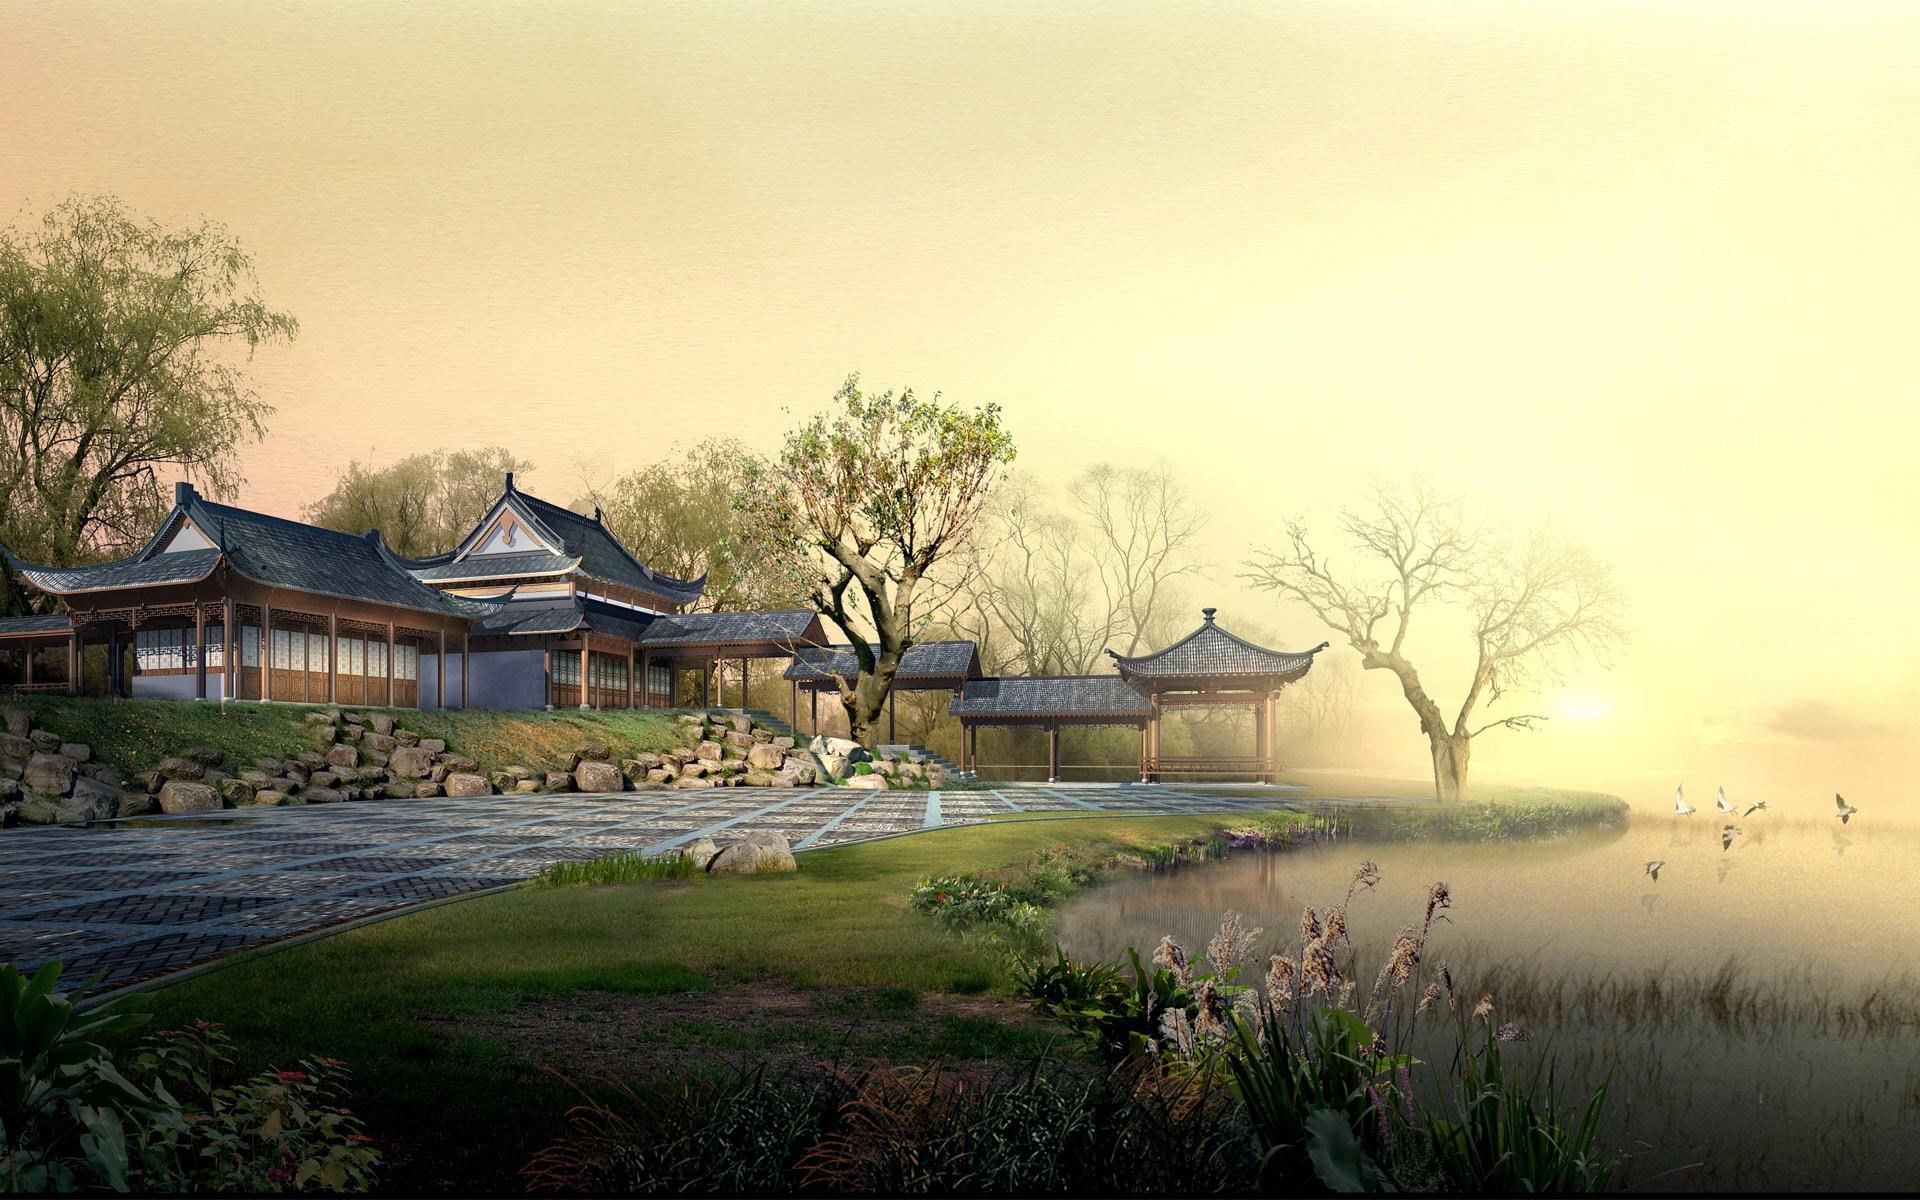 Chinese landscape wallpaper 5 1152x720 Chinese landscape wallpaper 1920x1200